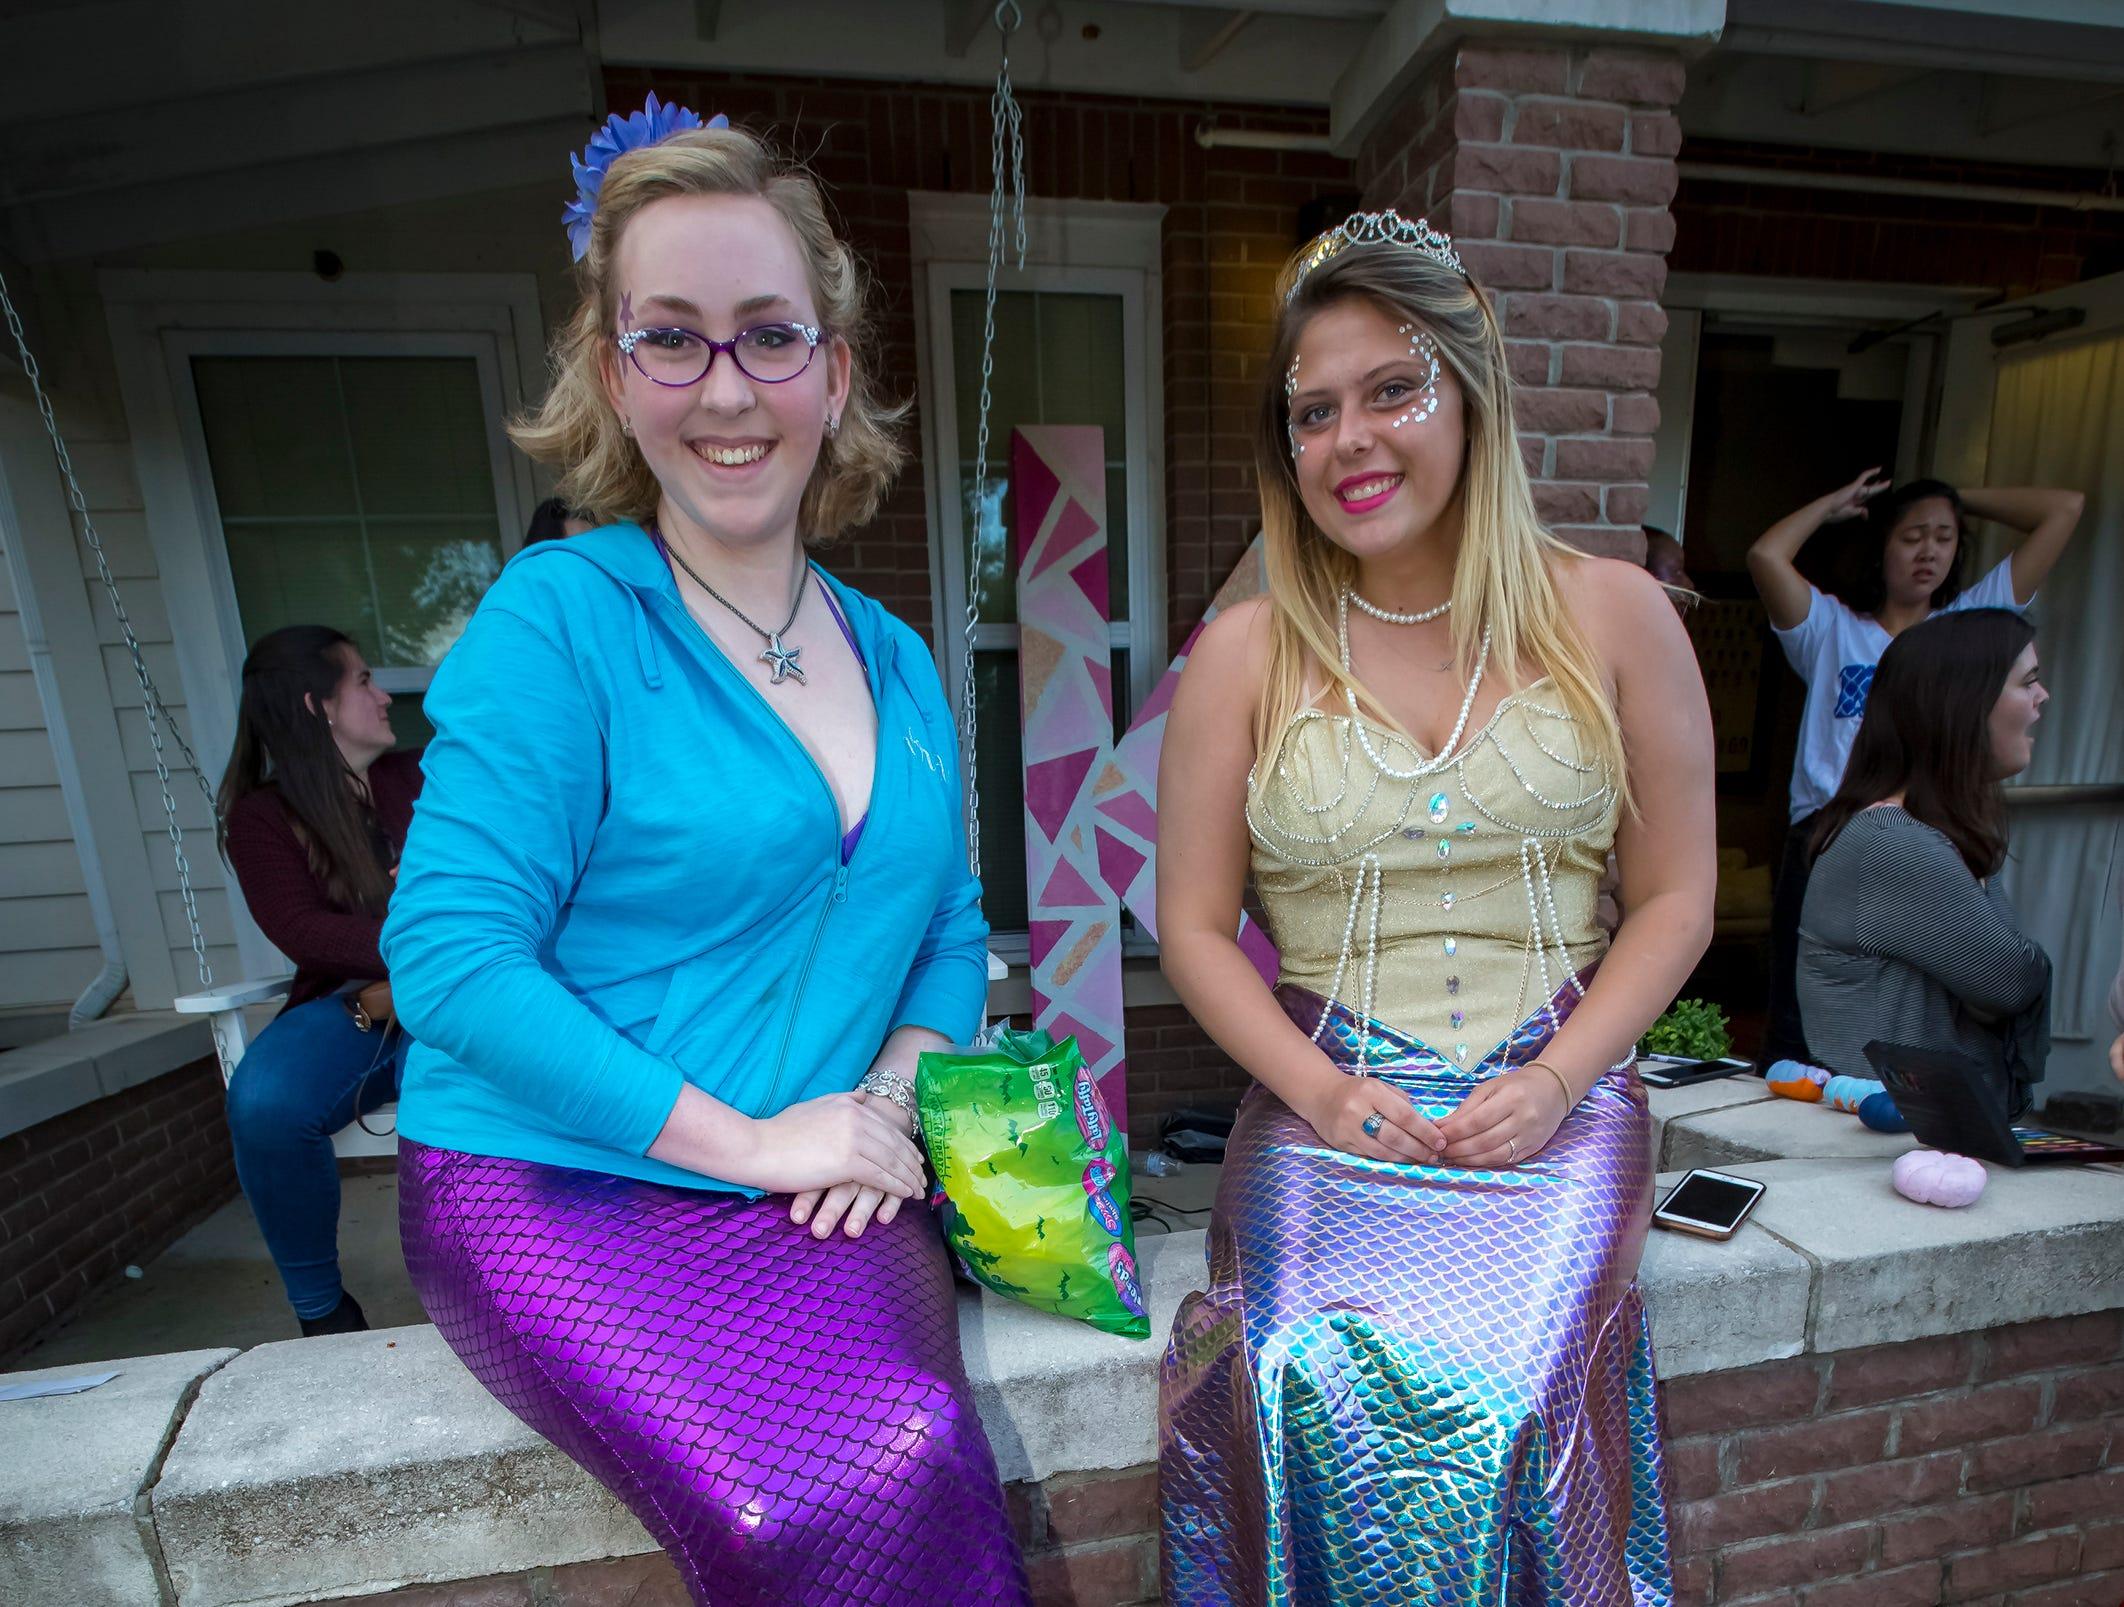 Emily Blackburn and Mara Kent  at the Greek Row Trick or Treat at MTSU on Tuesday, Oct. 30, 2018.